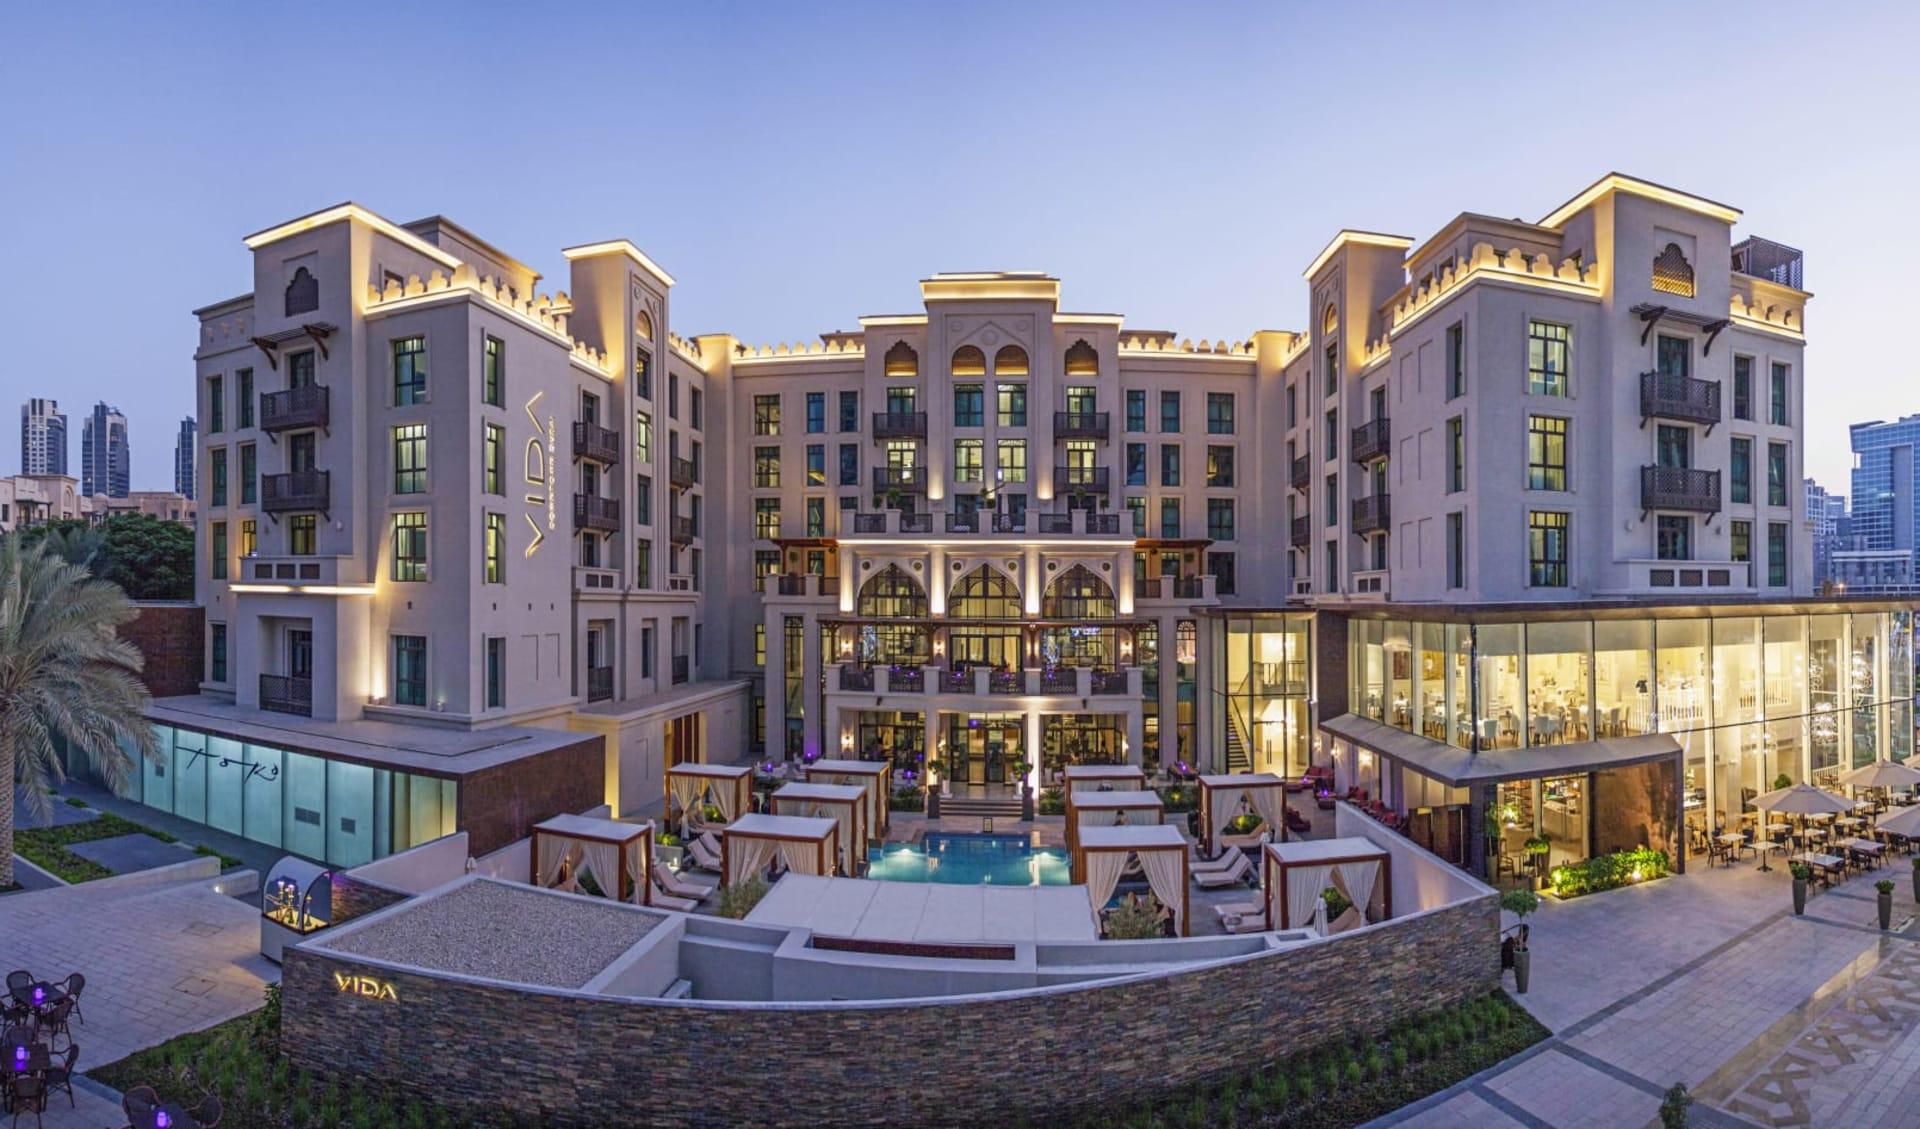 Vida Downtown in Dubai: